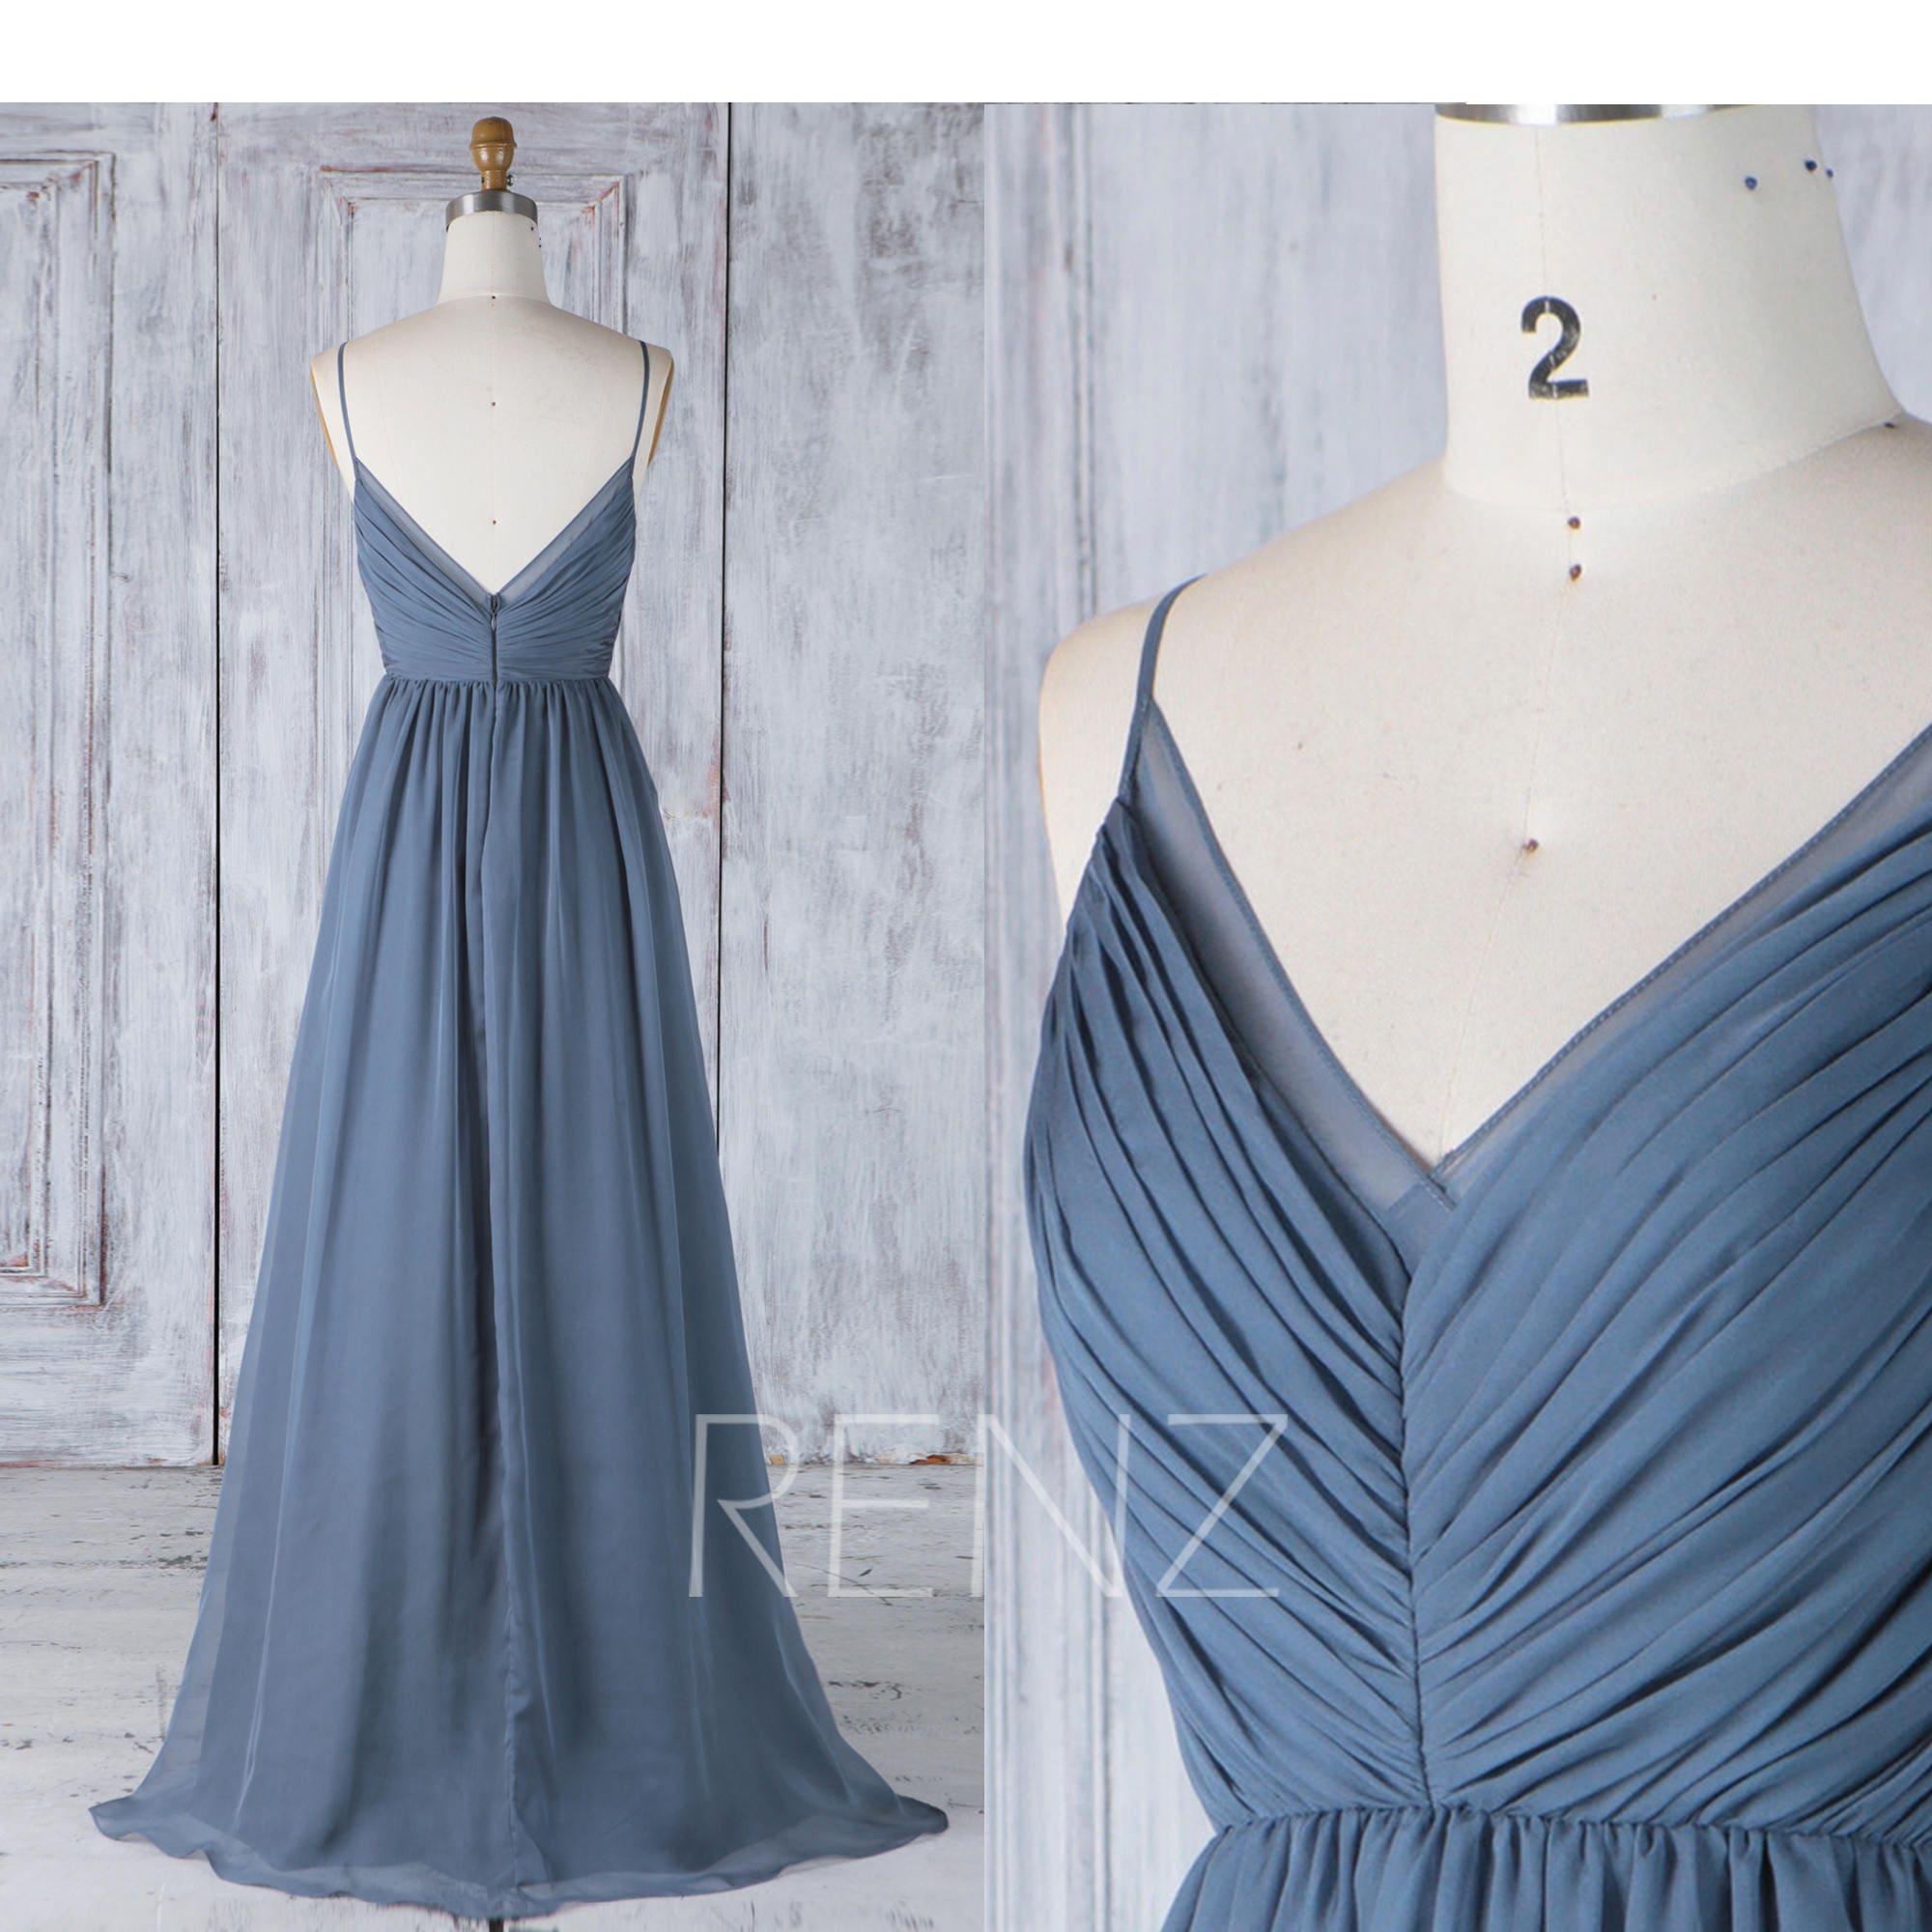 Bridesmaid Dress Dark Steel Blue Chiffon DressWedding